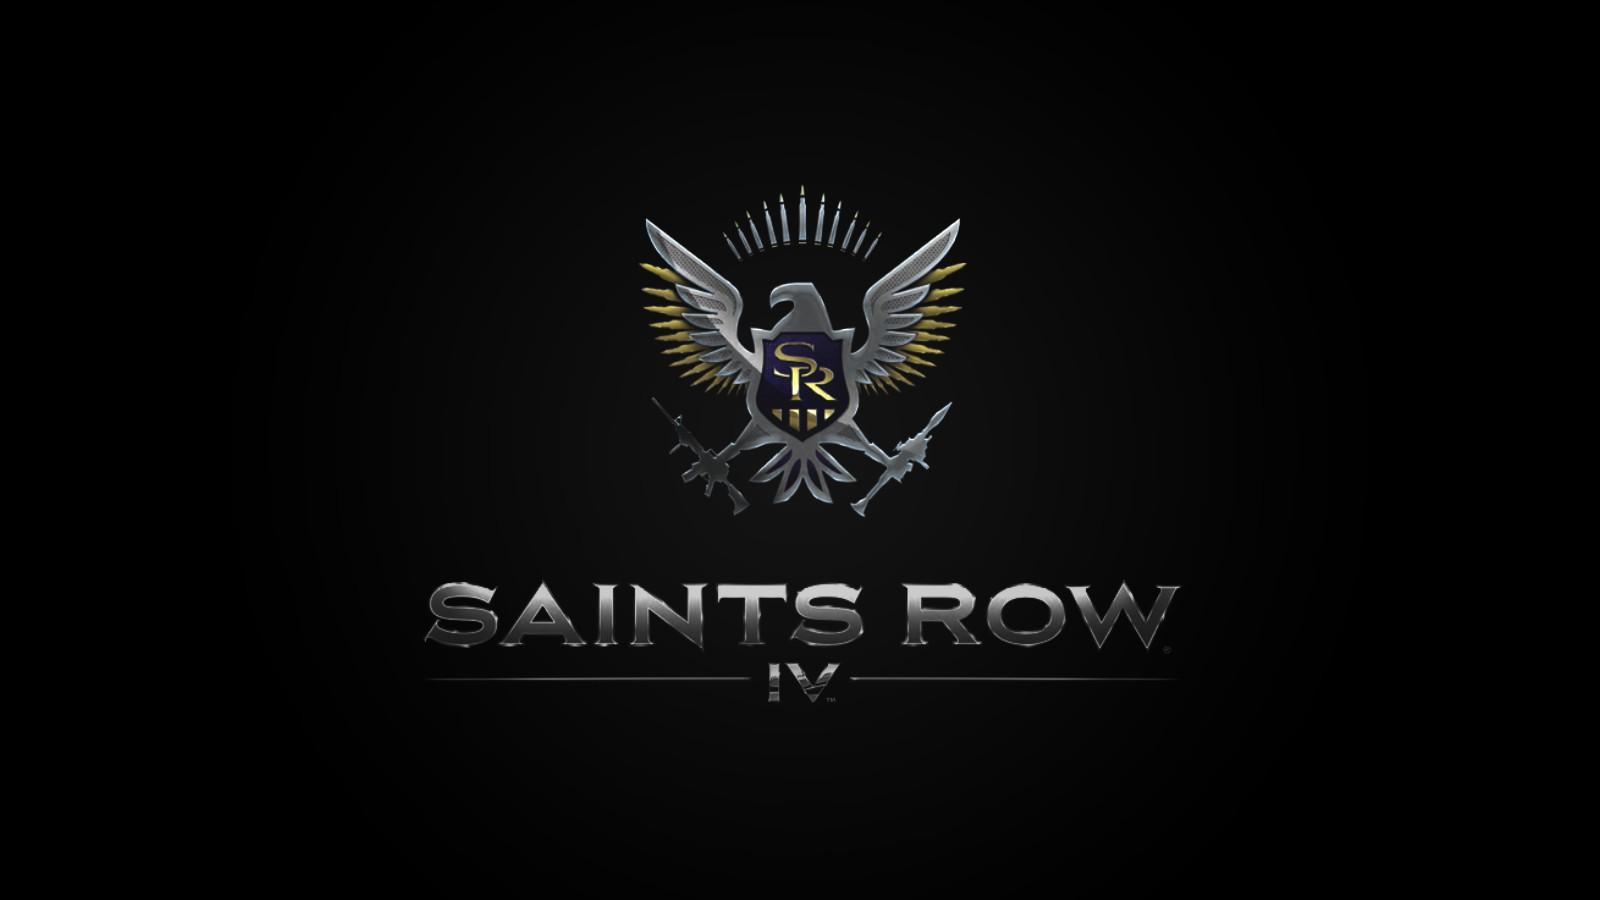 20160924101932_1.jpg - Saints Row 4